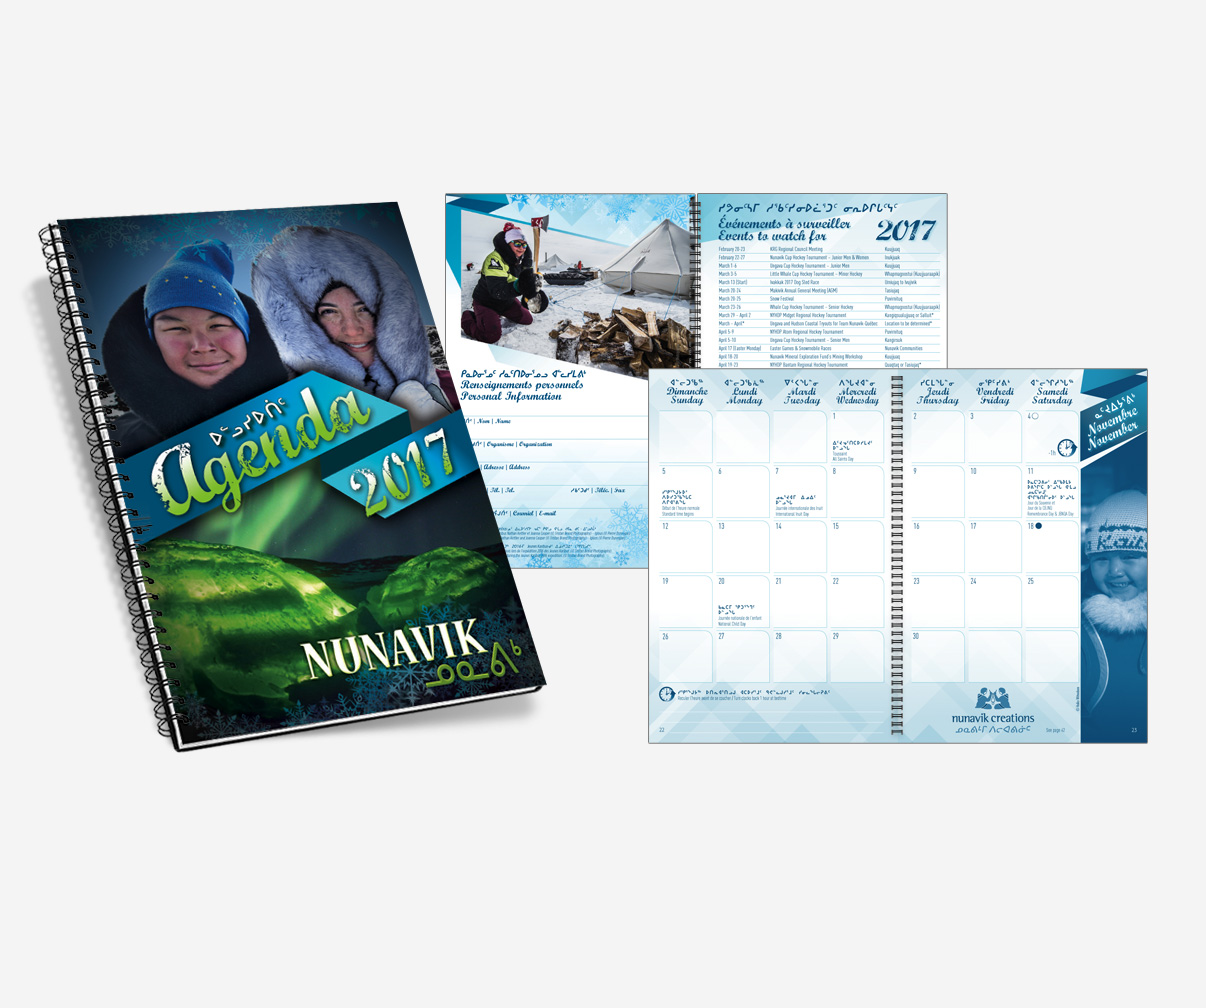 Association touristique du Nunavik - Agenda 2017